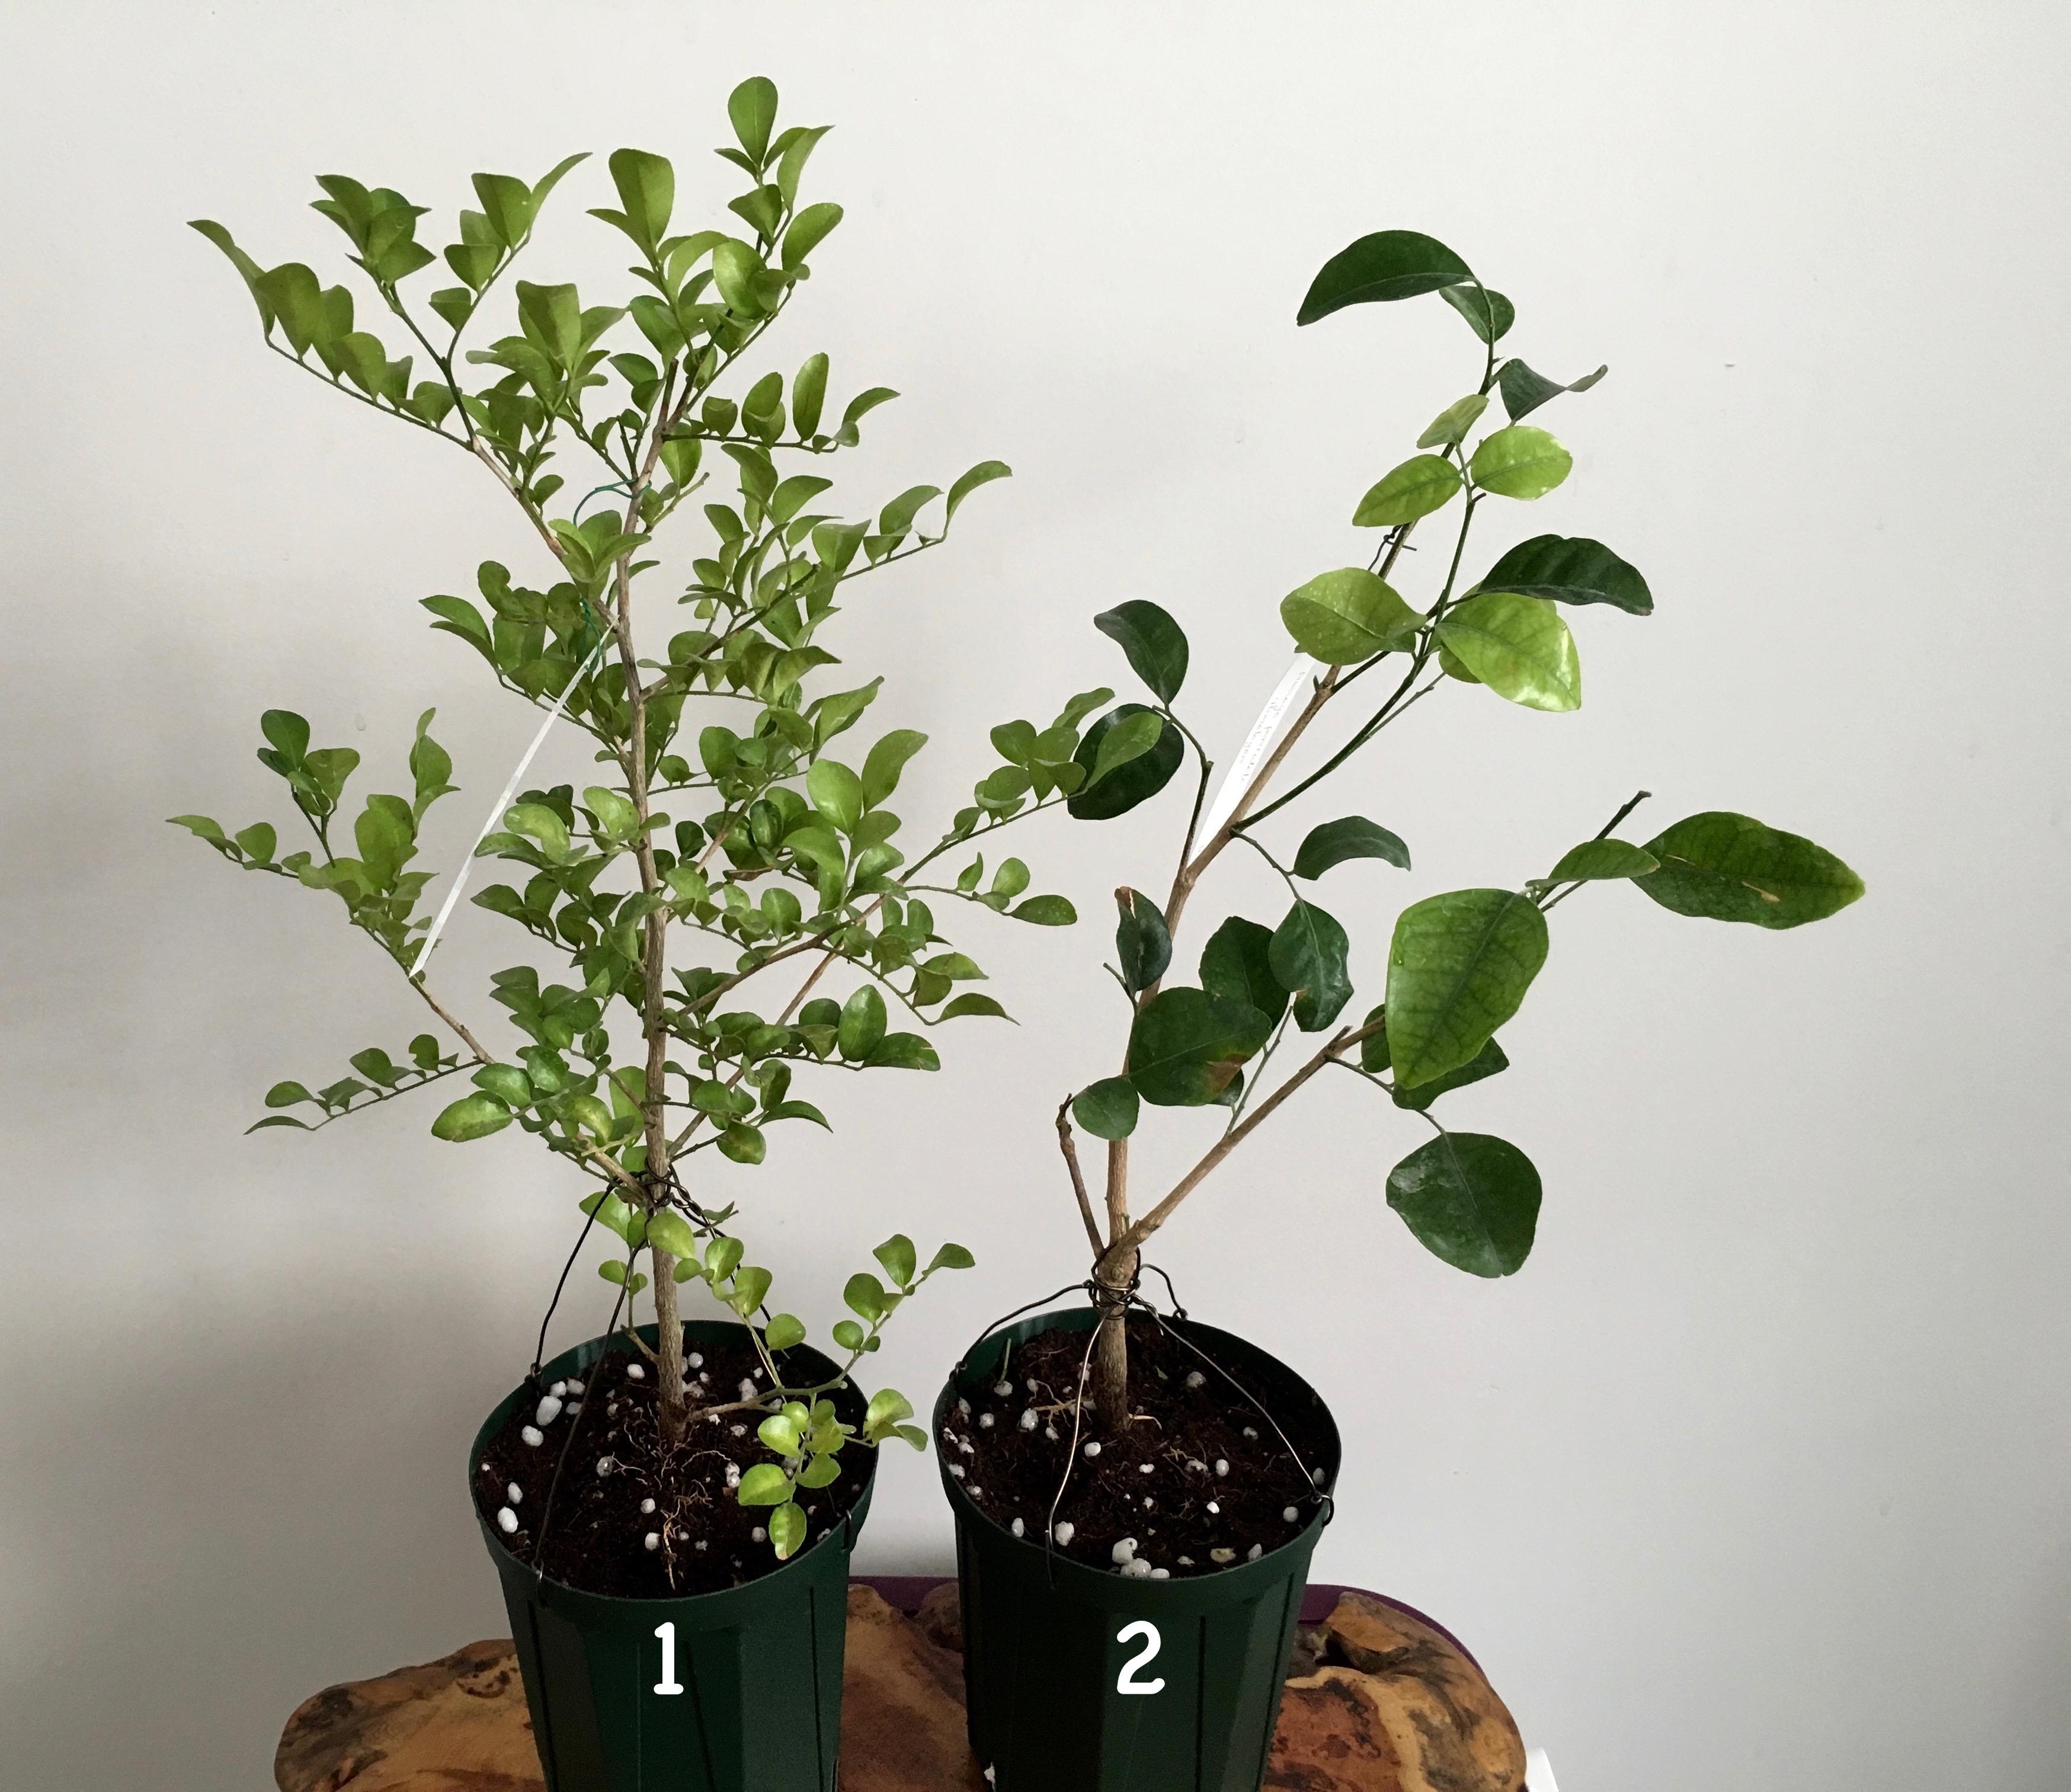 Murraya paniculata 'Dwarf' (wavy leaf) (слева) Murraya paniculata 'Himalayan' (справа)